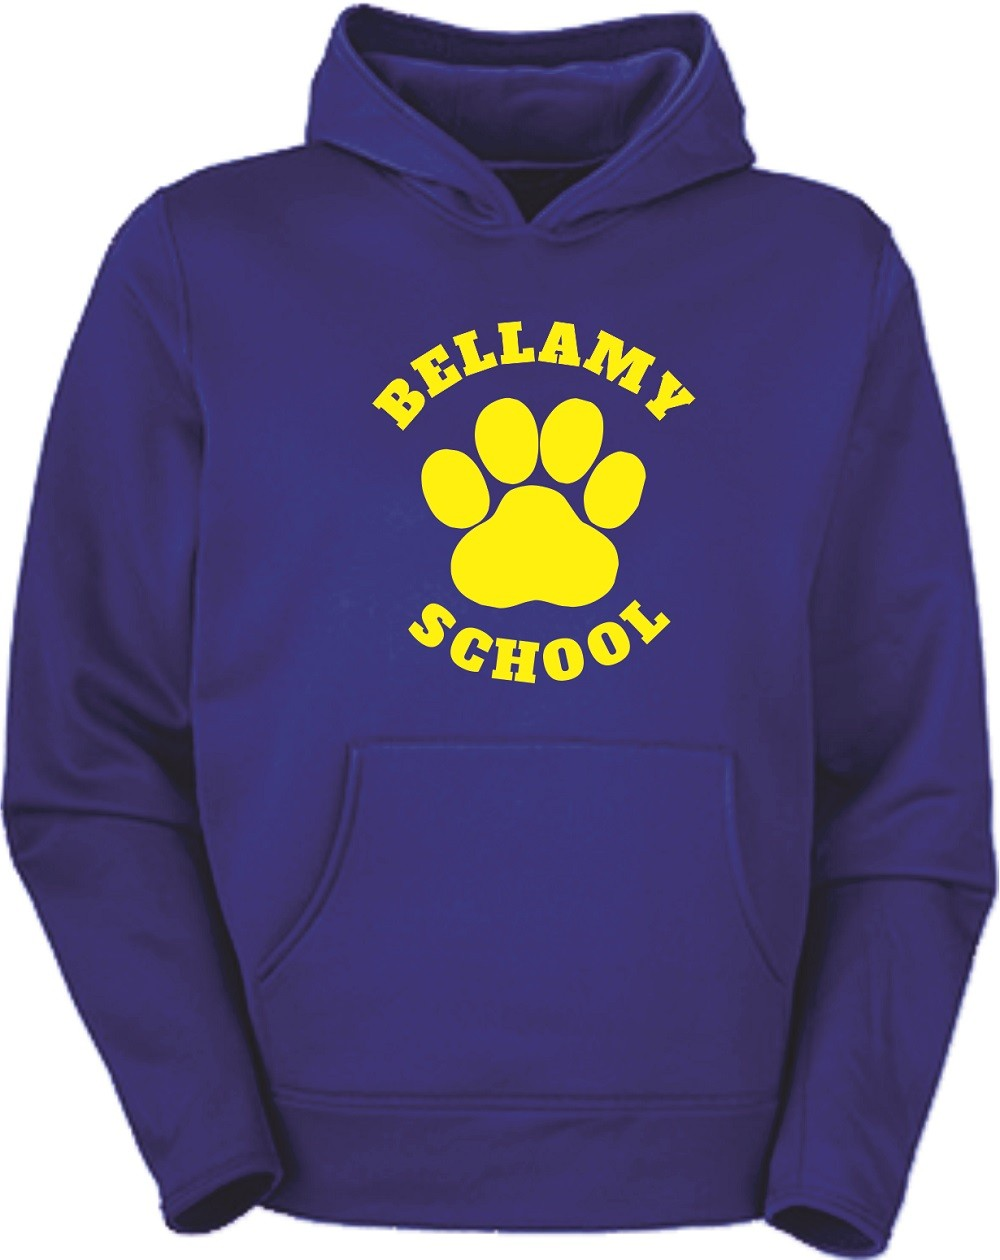 Bellamy Paw Print Pullover Hoodies